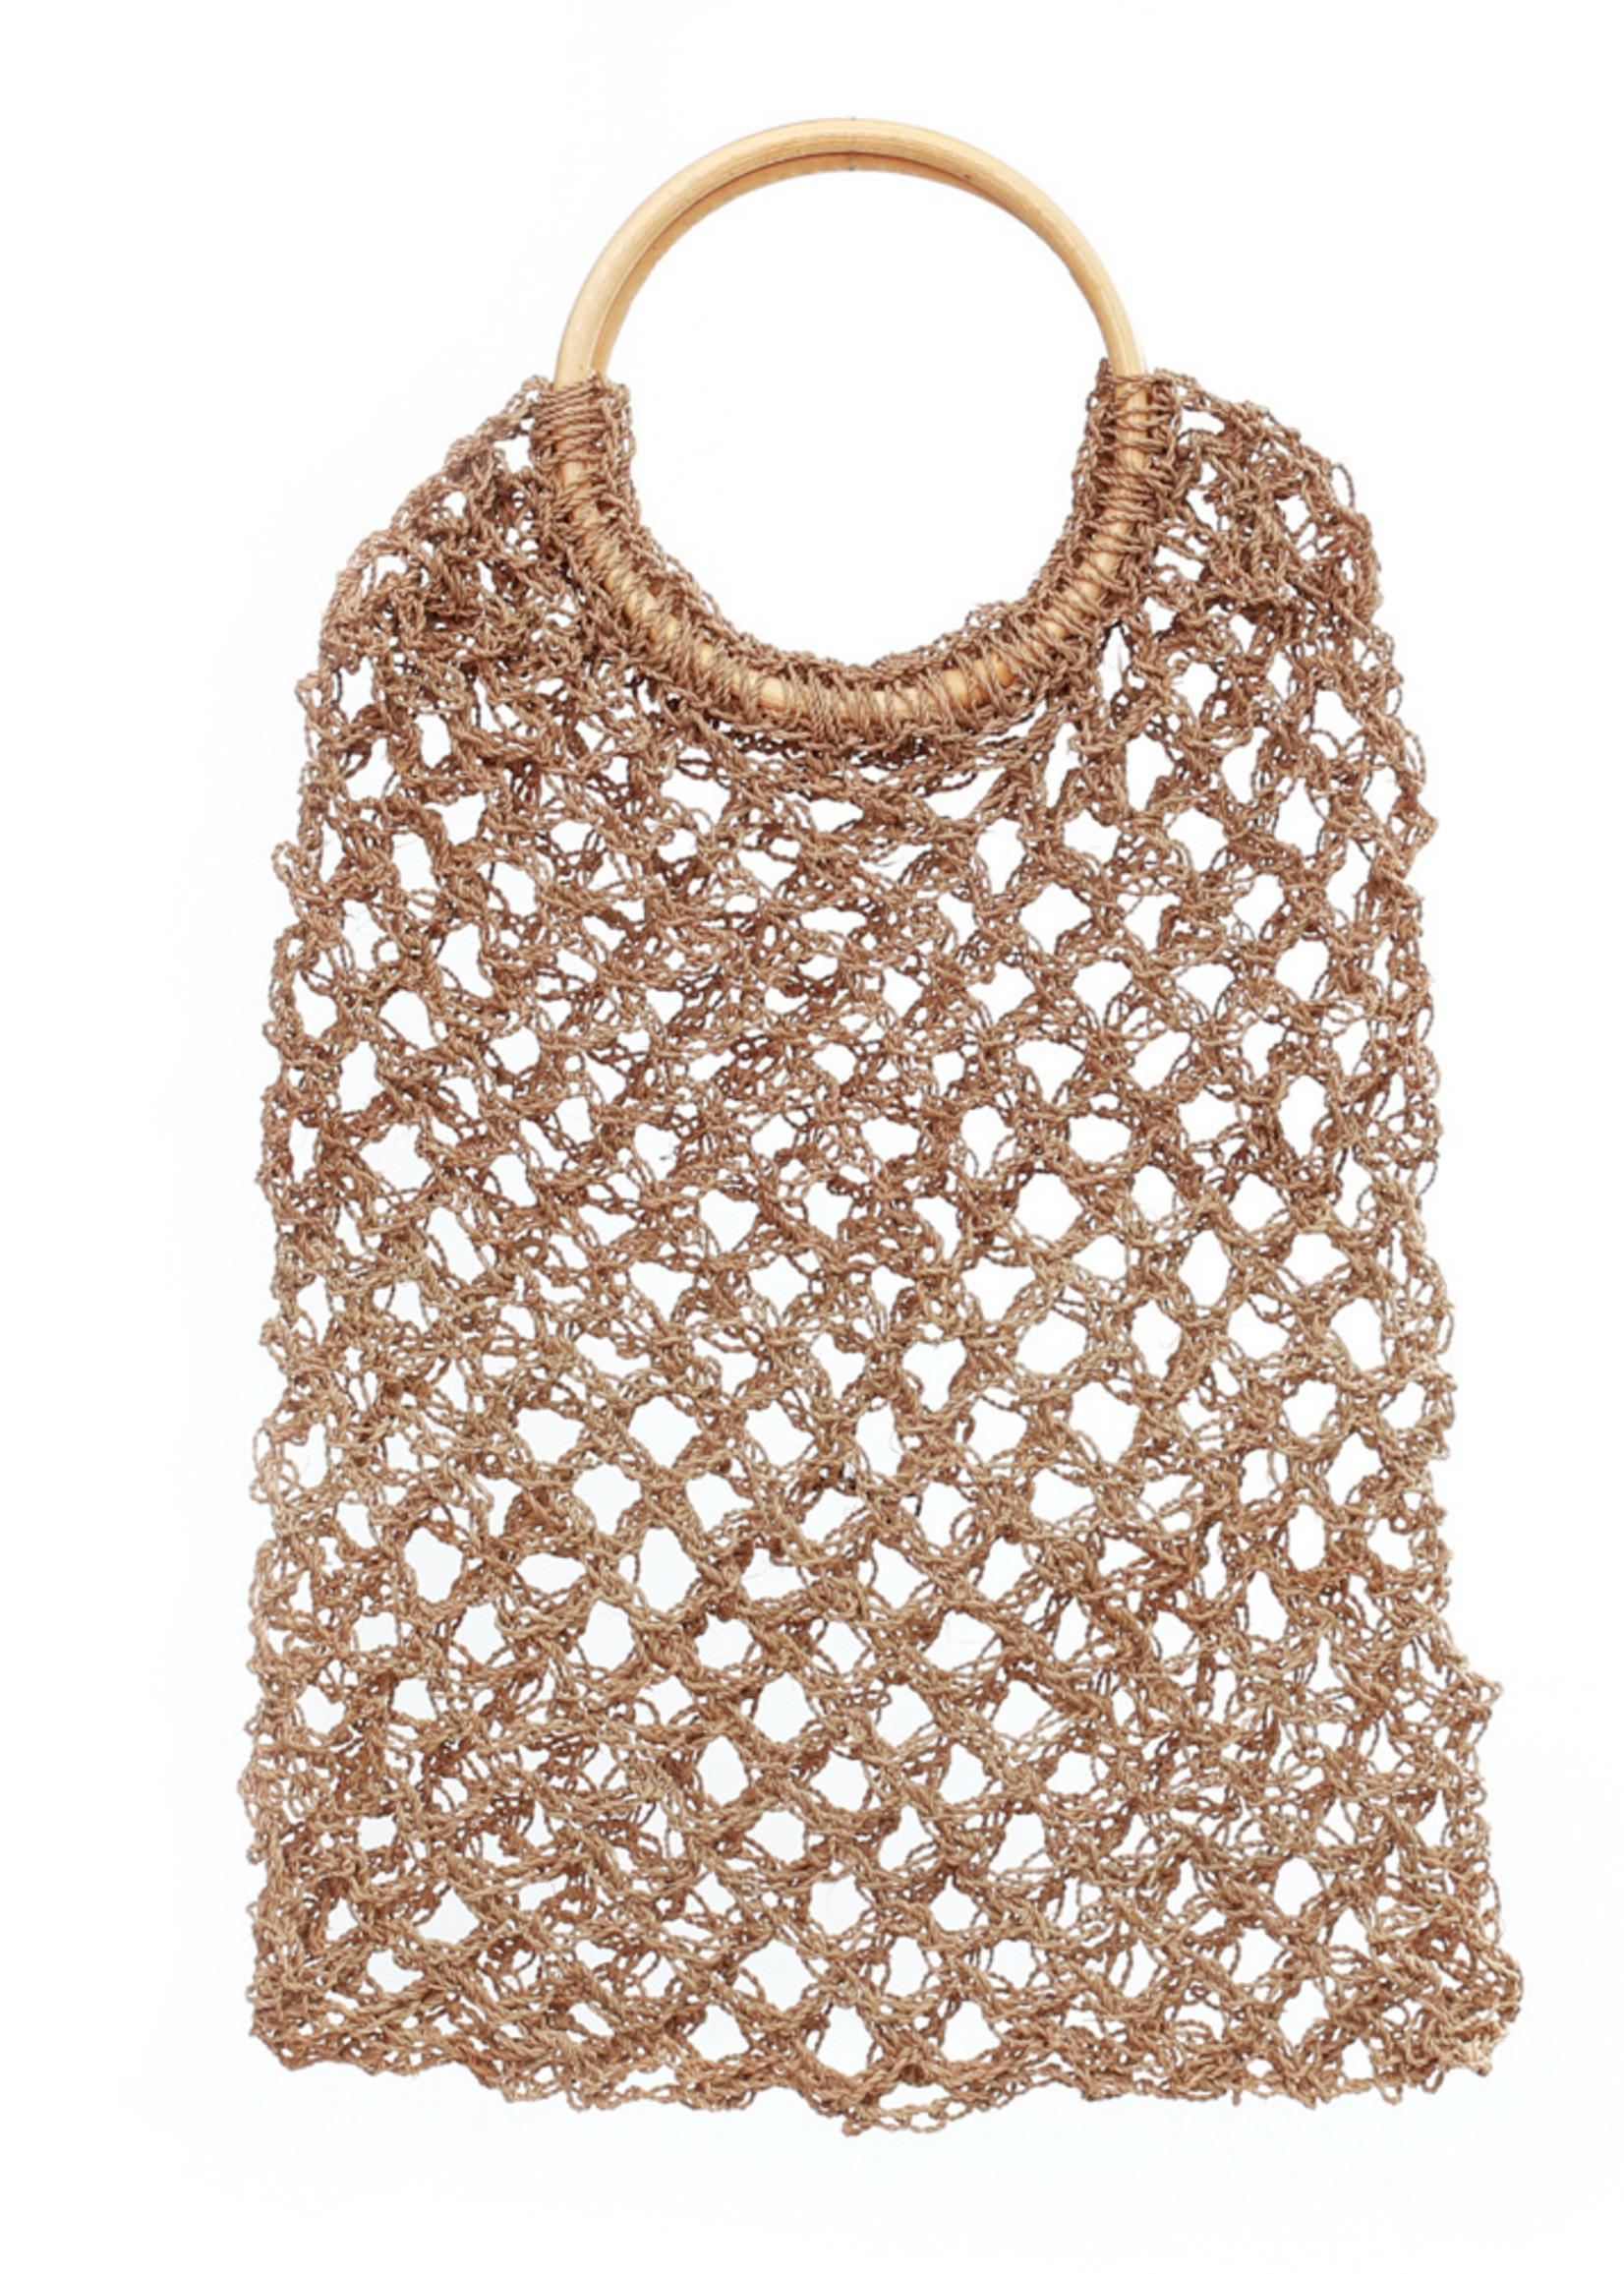 The Seagrass Crochet Shopper - Natural